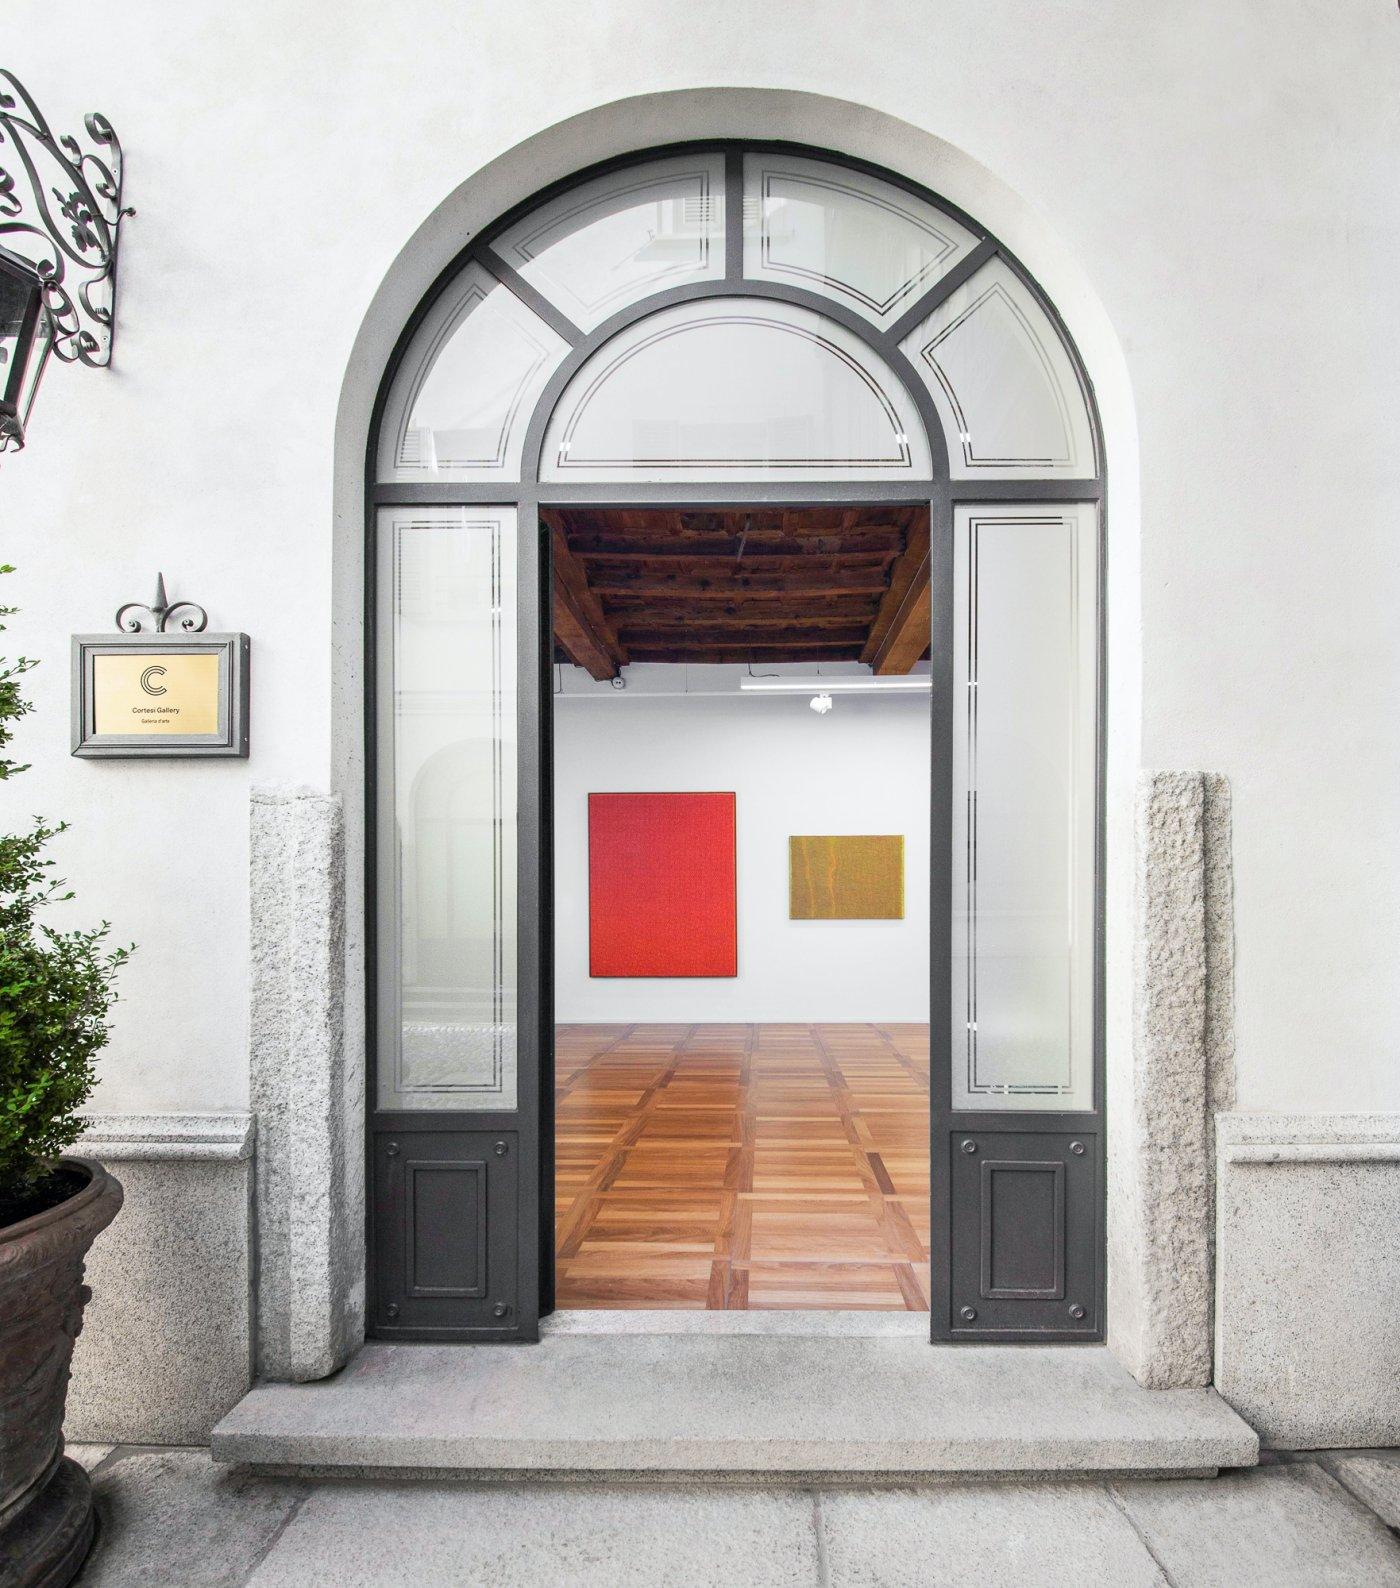 Cortesi Gallery Milan SPACES OF LIGHT 6